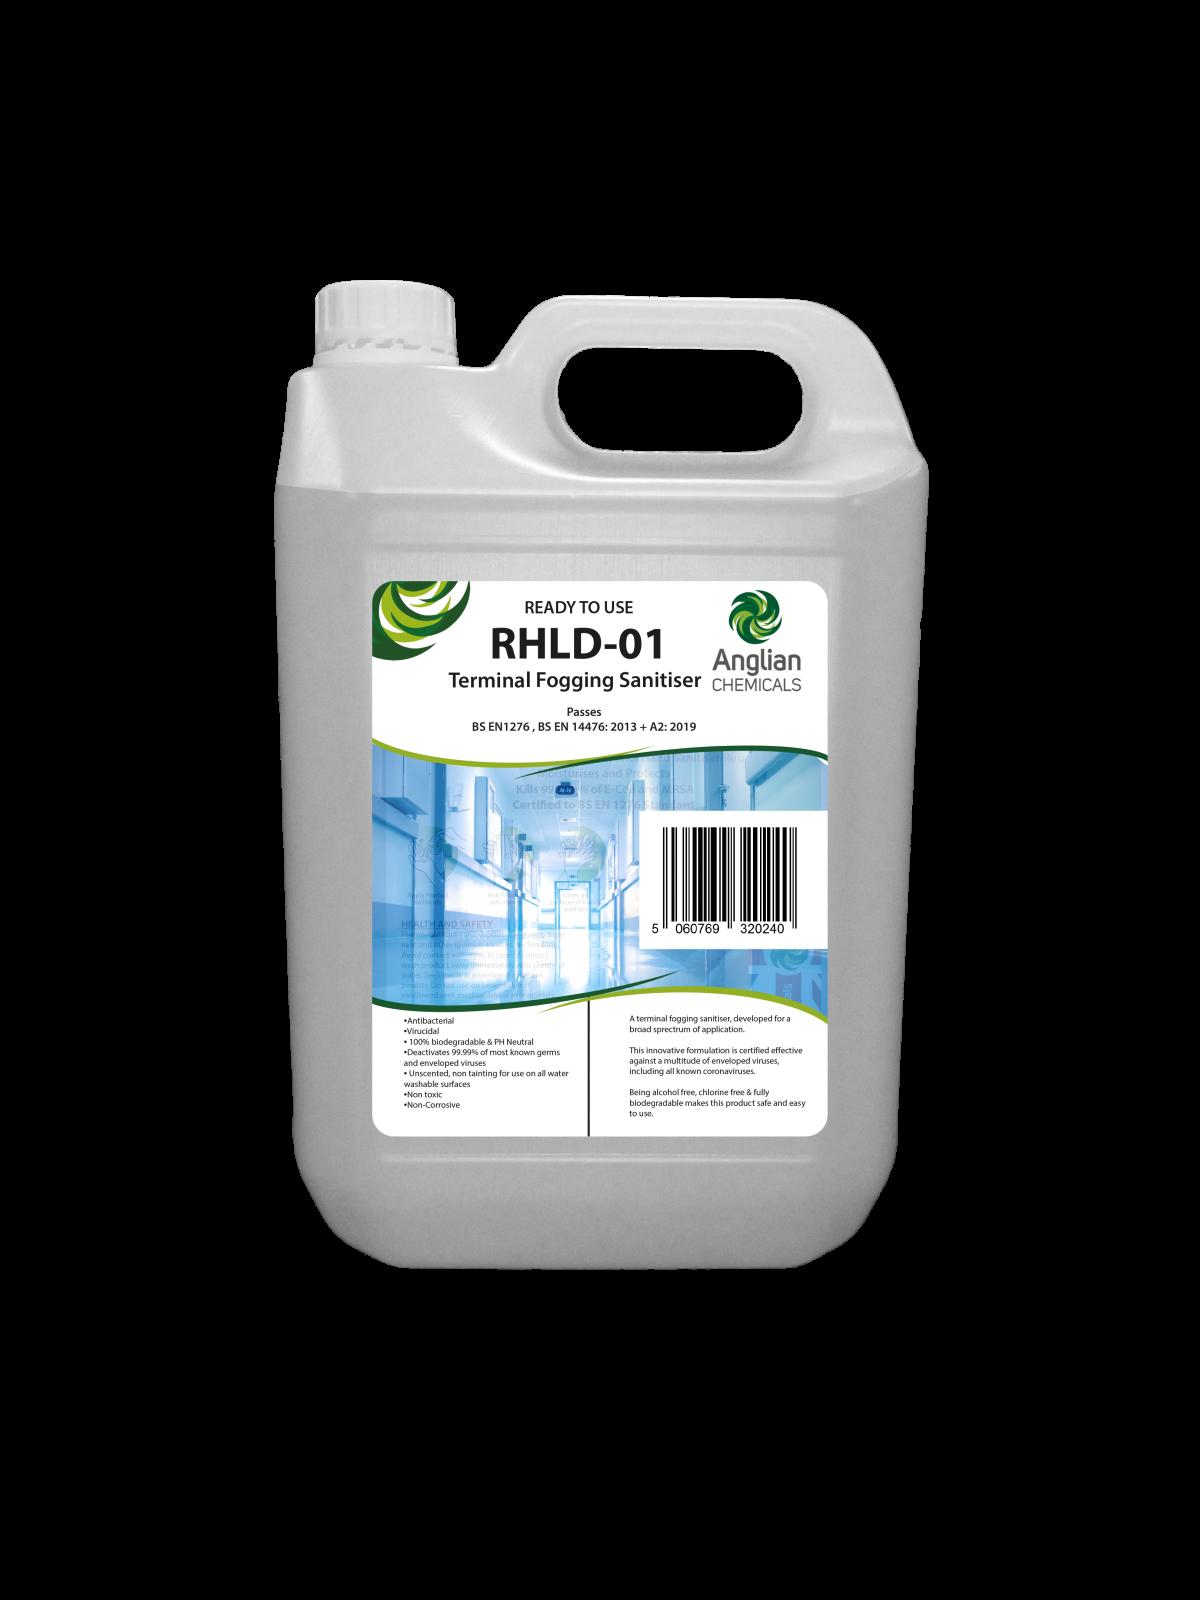 RHLD-01 Terminal Fogging Sanitiser